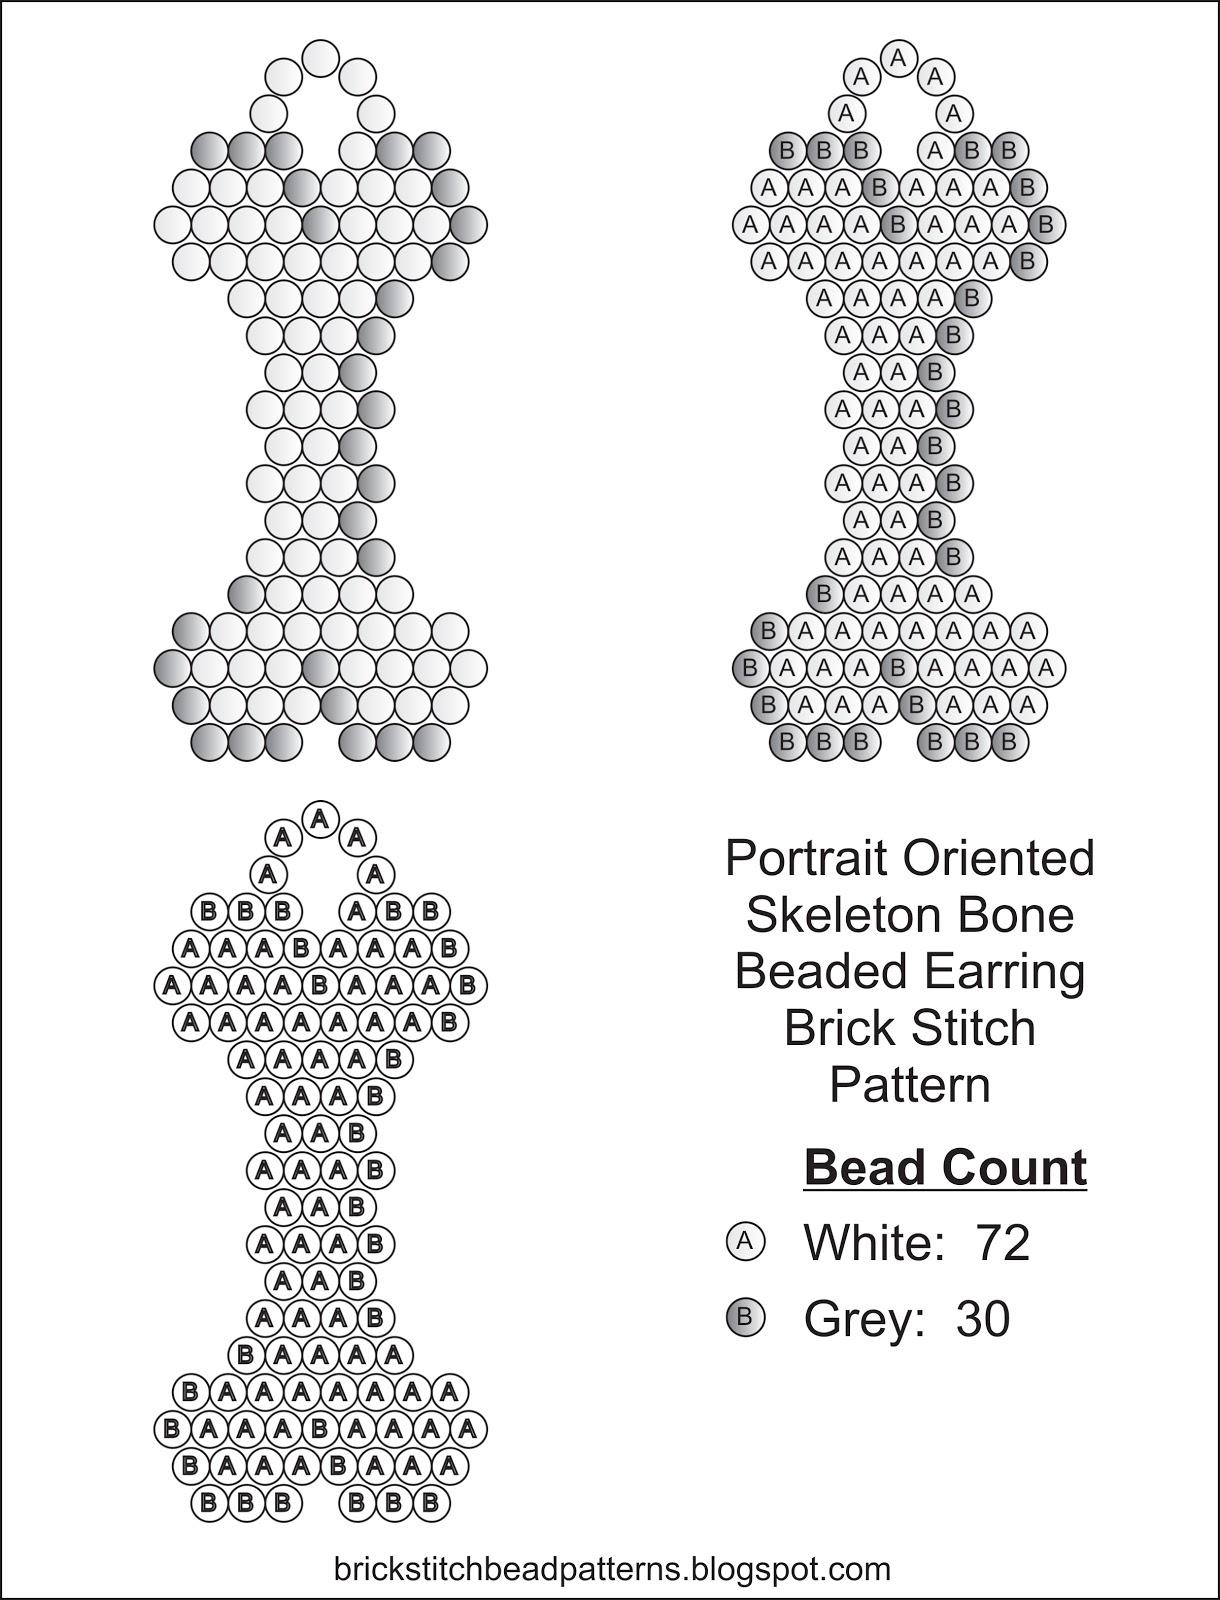 Brick Stitch Bead Patterns Journal: Skeleton Bone Free